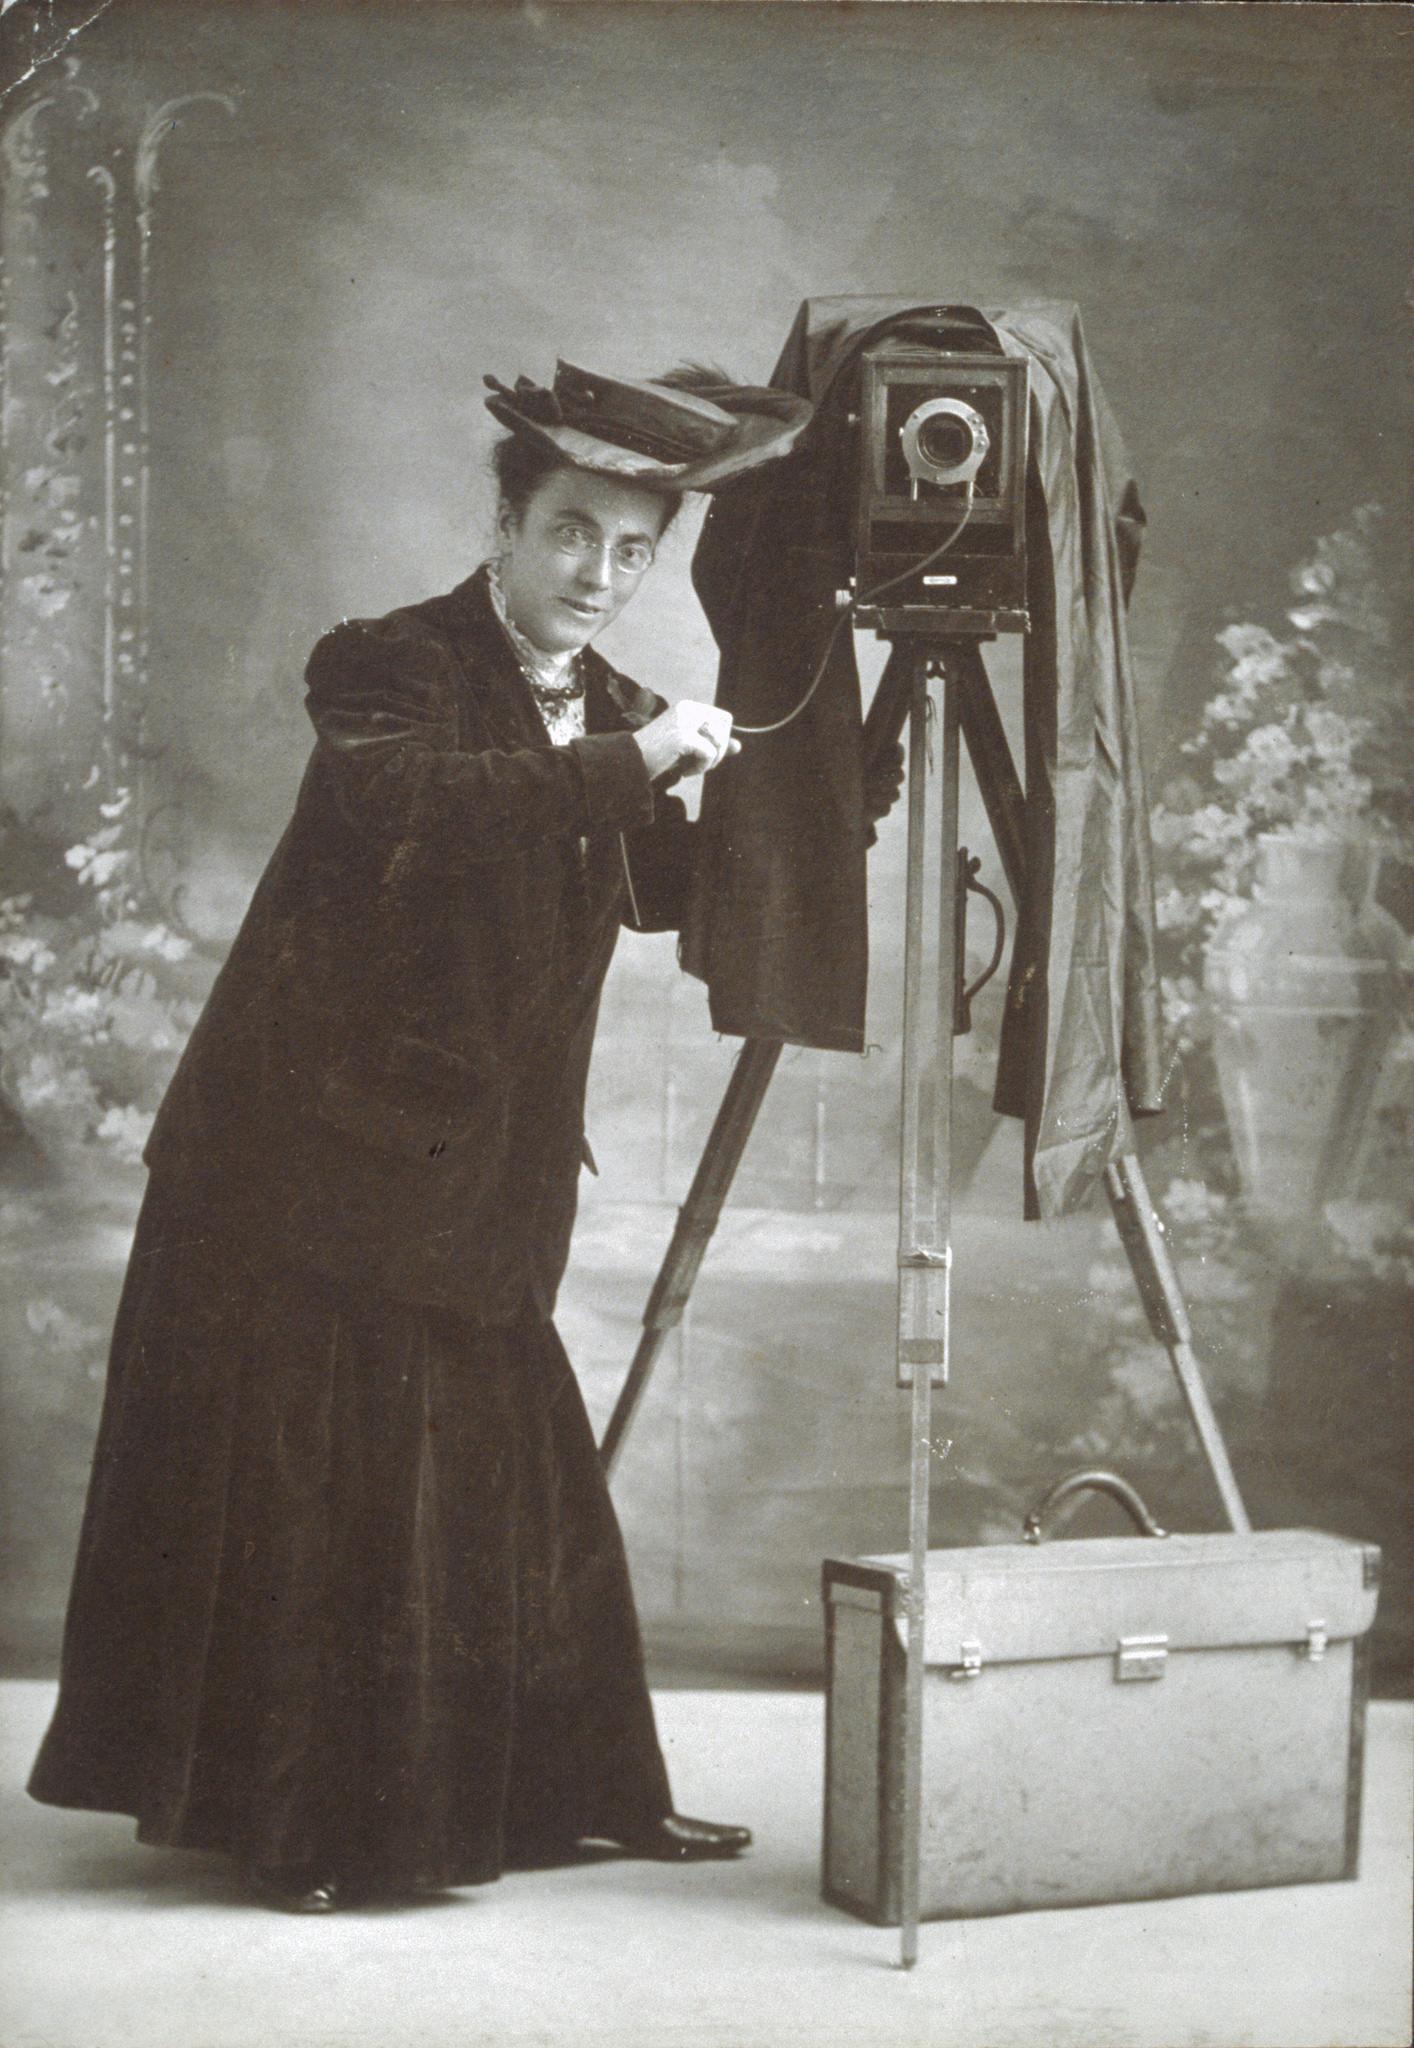 Jessie Tarbox Beals, c. 1905